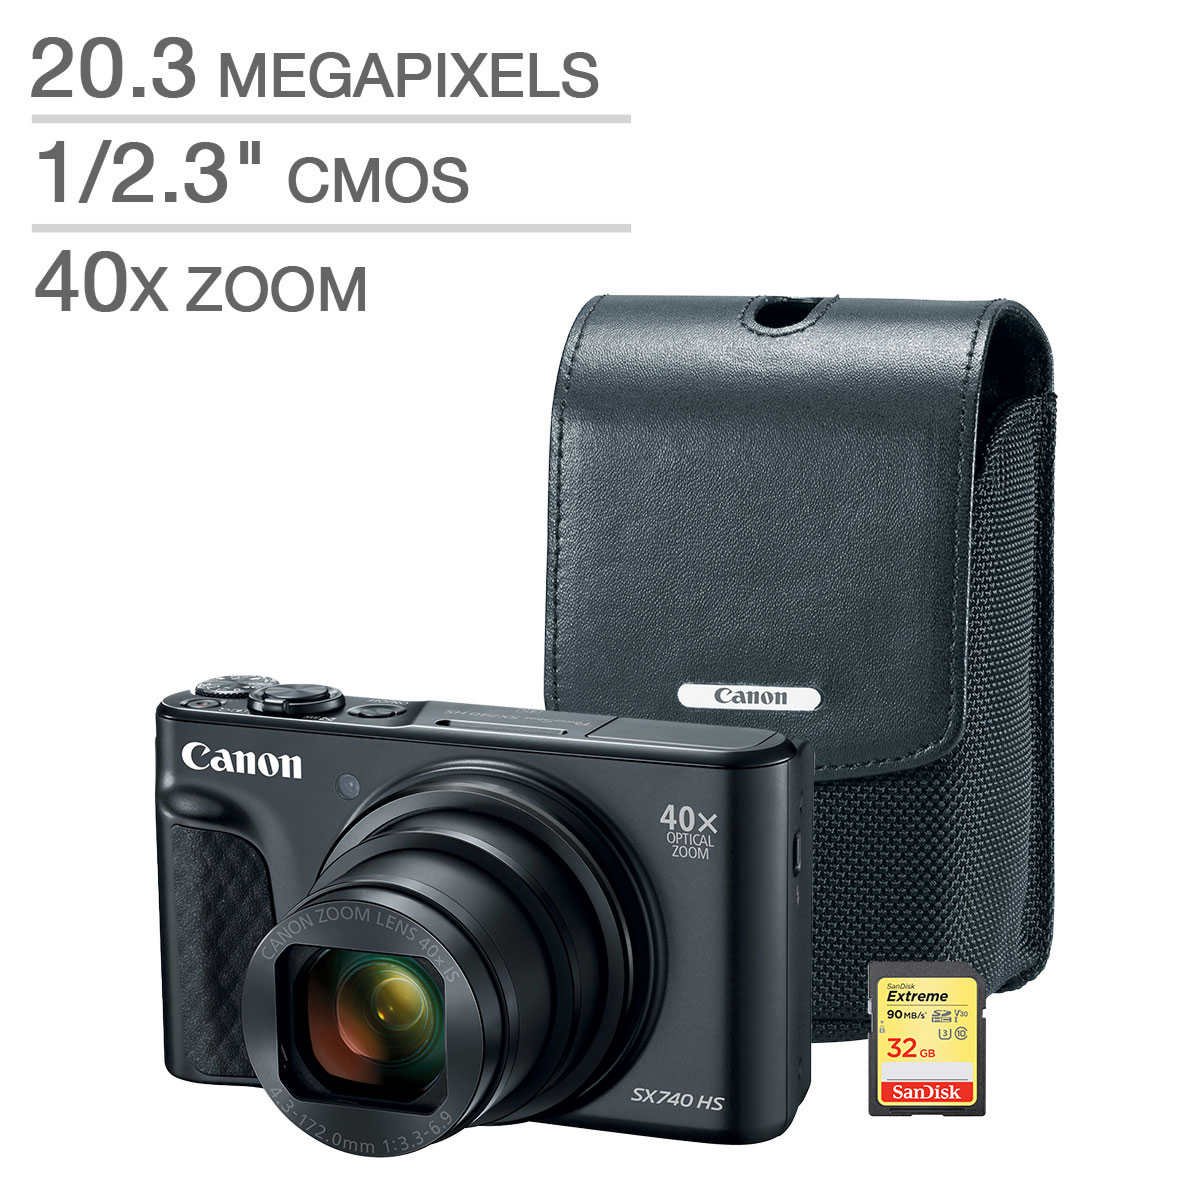 Canon Powershot Sx740 Digital Camera Bundle